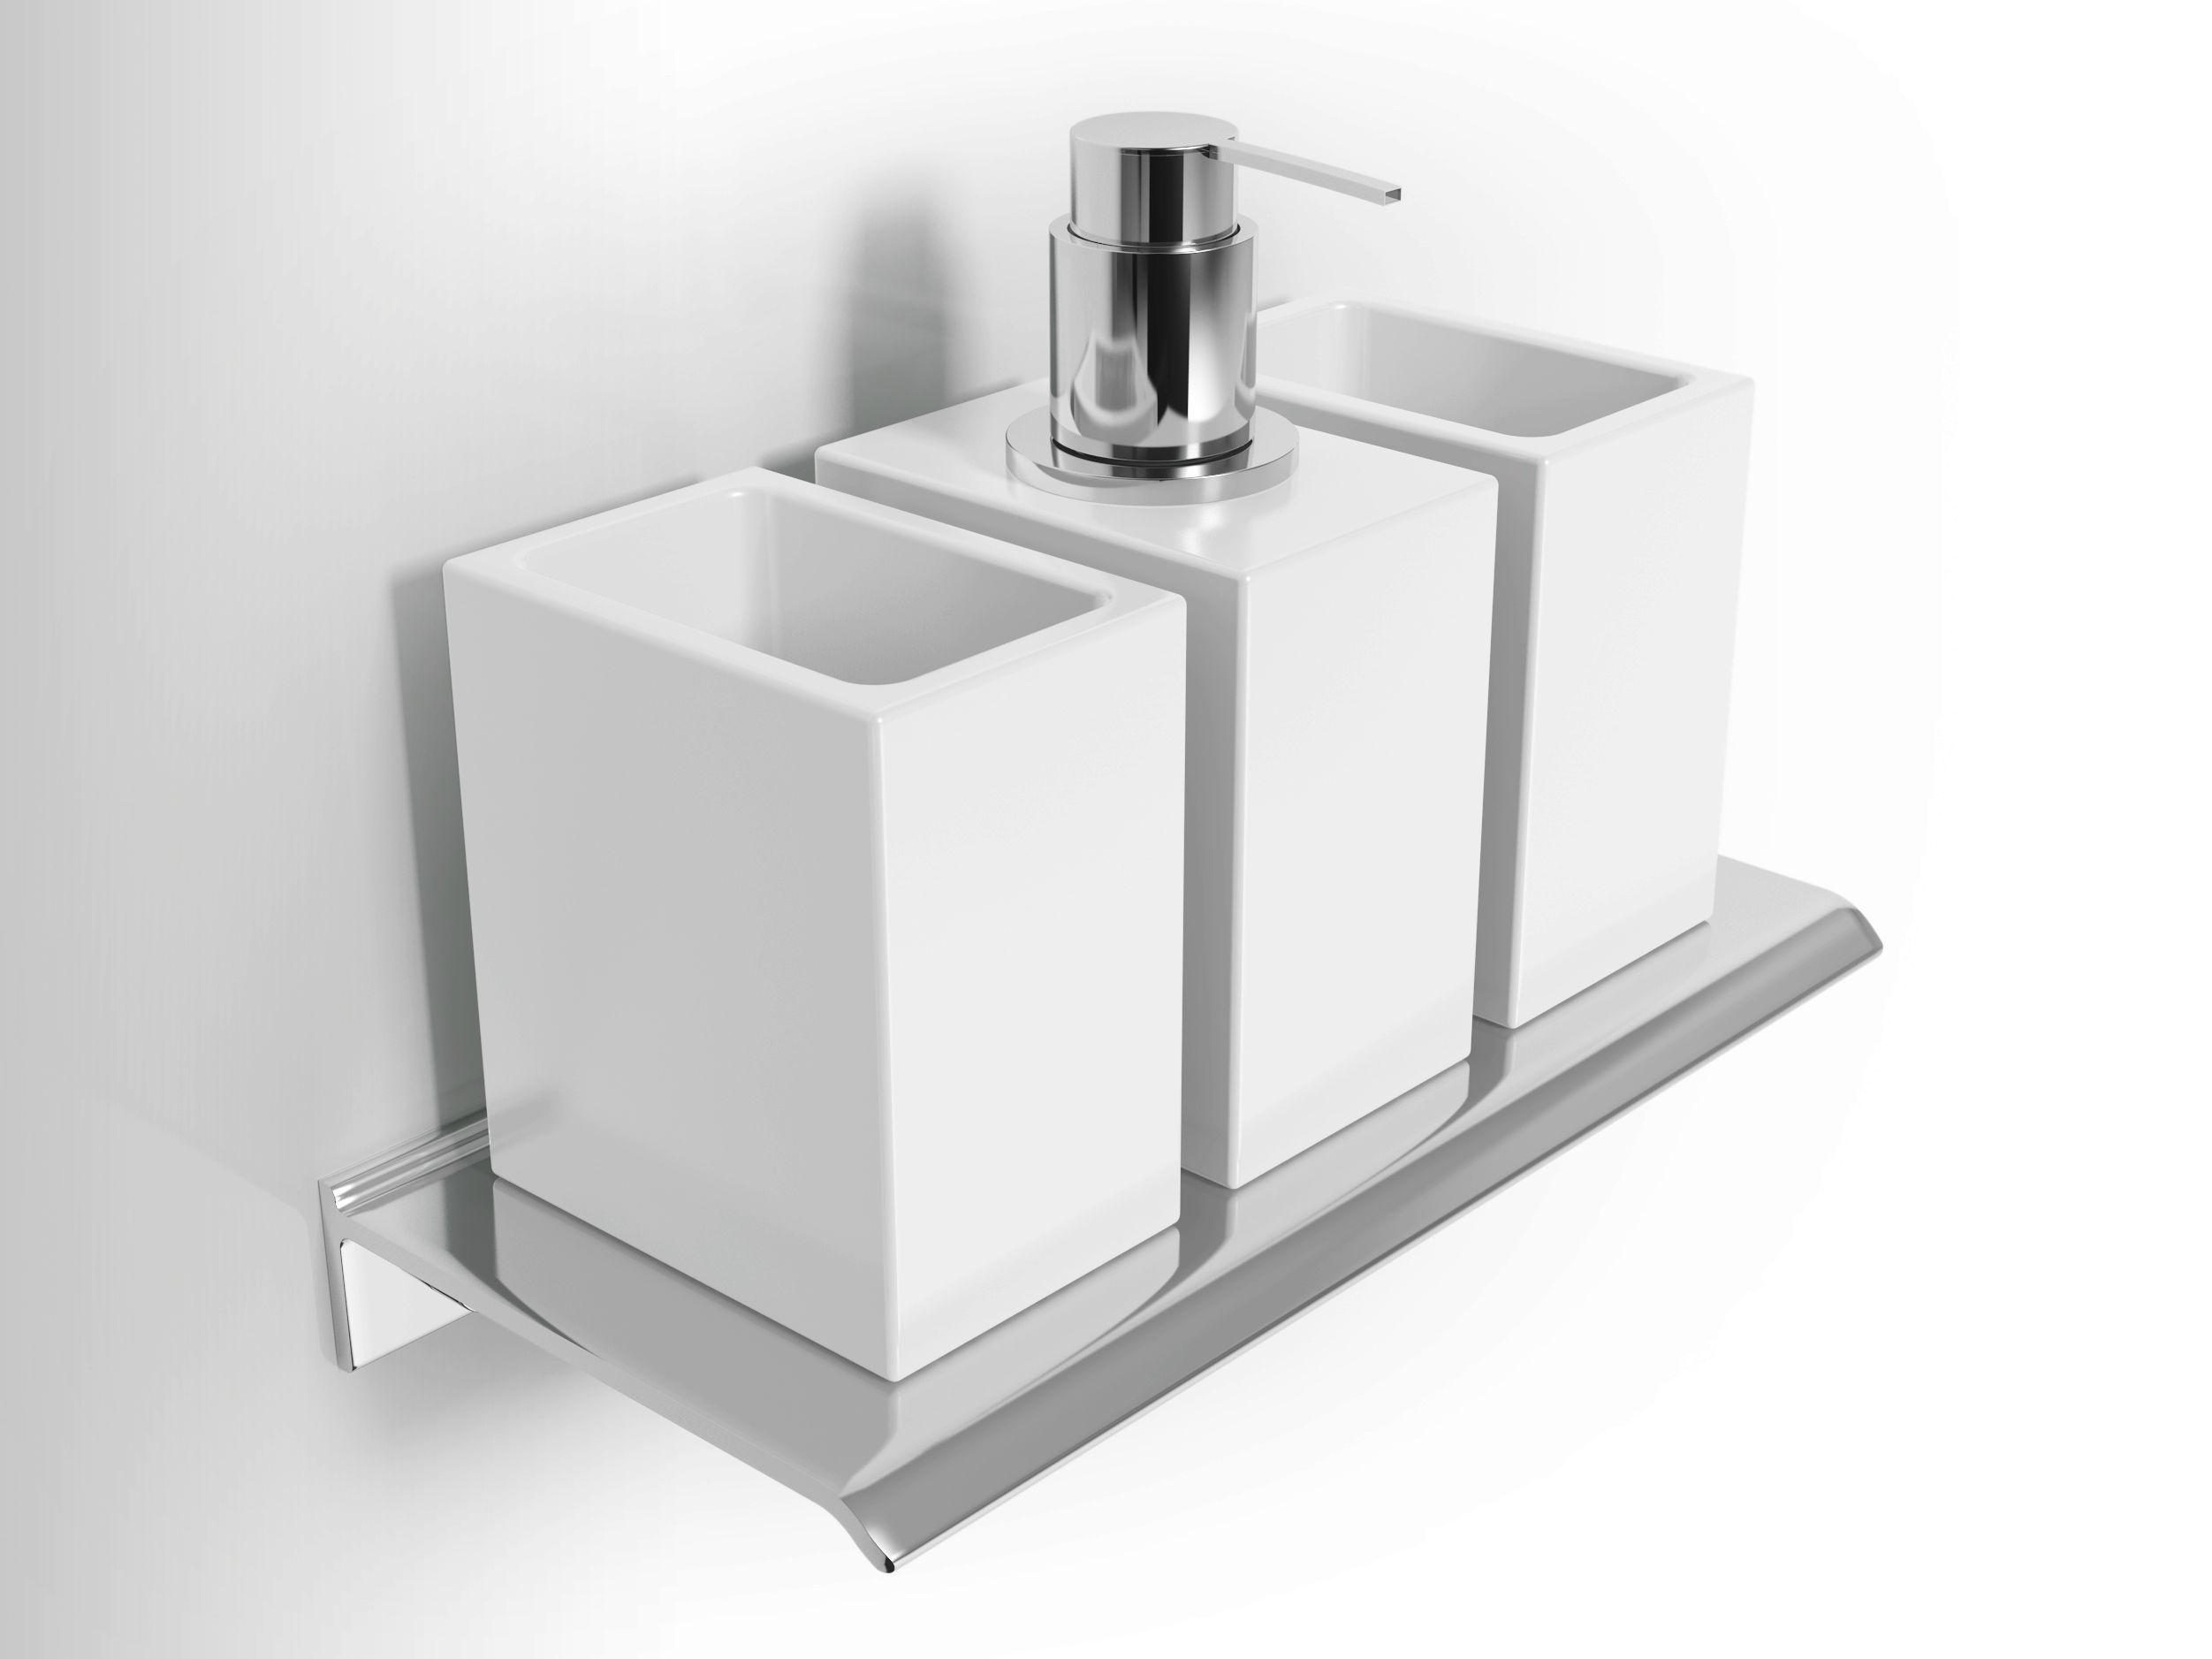 High Quality Wall Mounted Bathroom Soap Dispenser Sets Thedancingpa Com